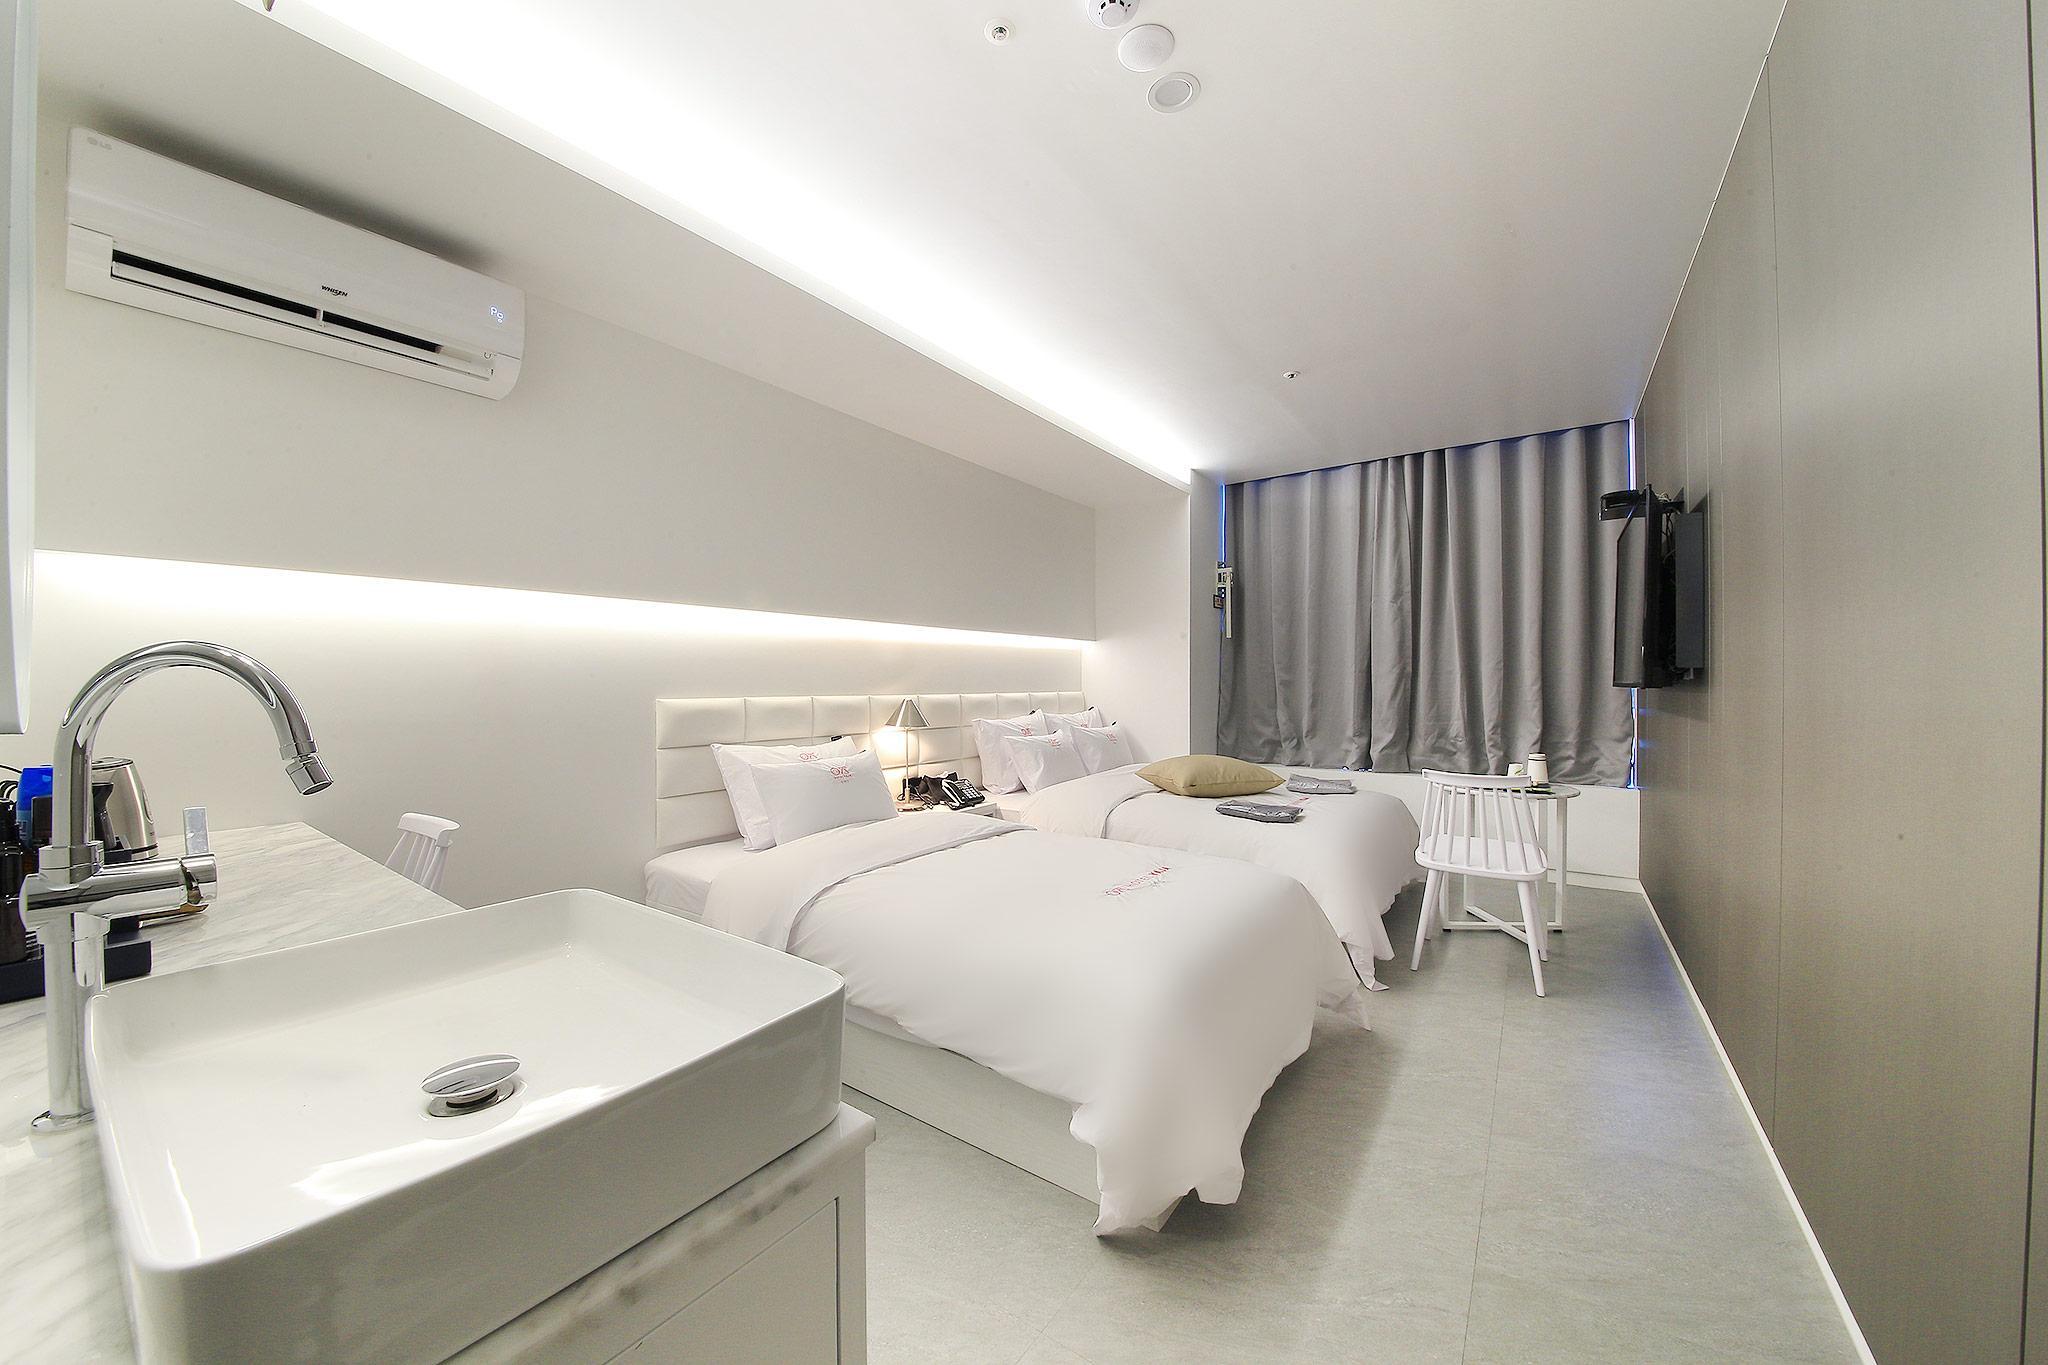 Yaja Hotel Wirye, Songpa